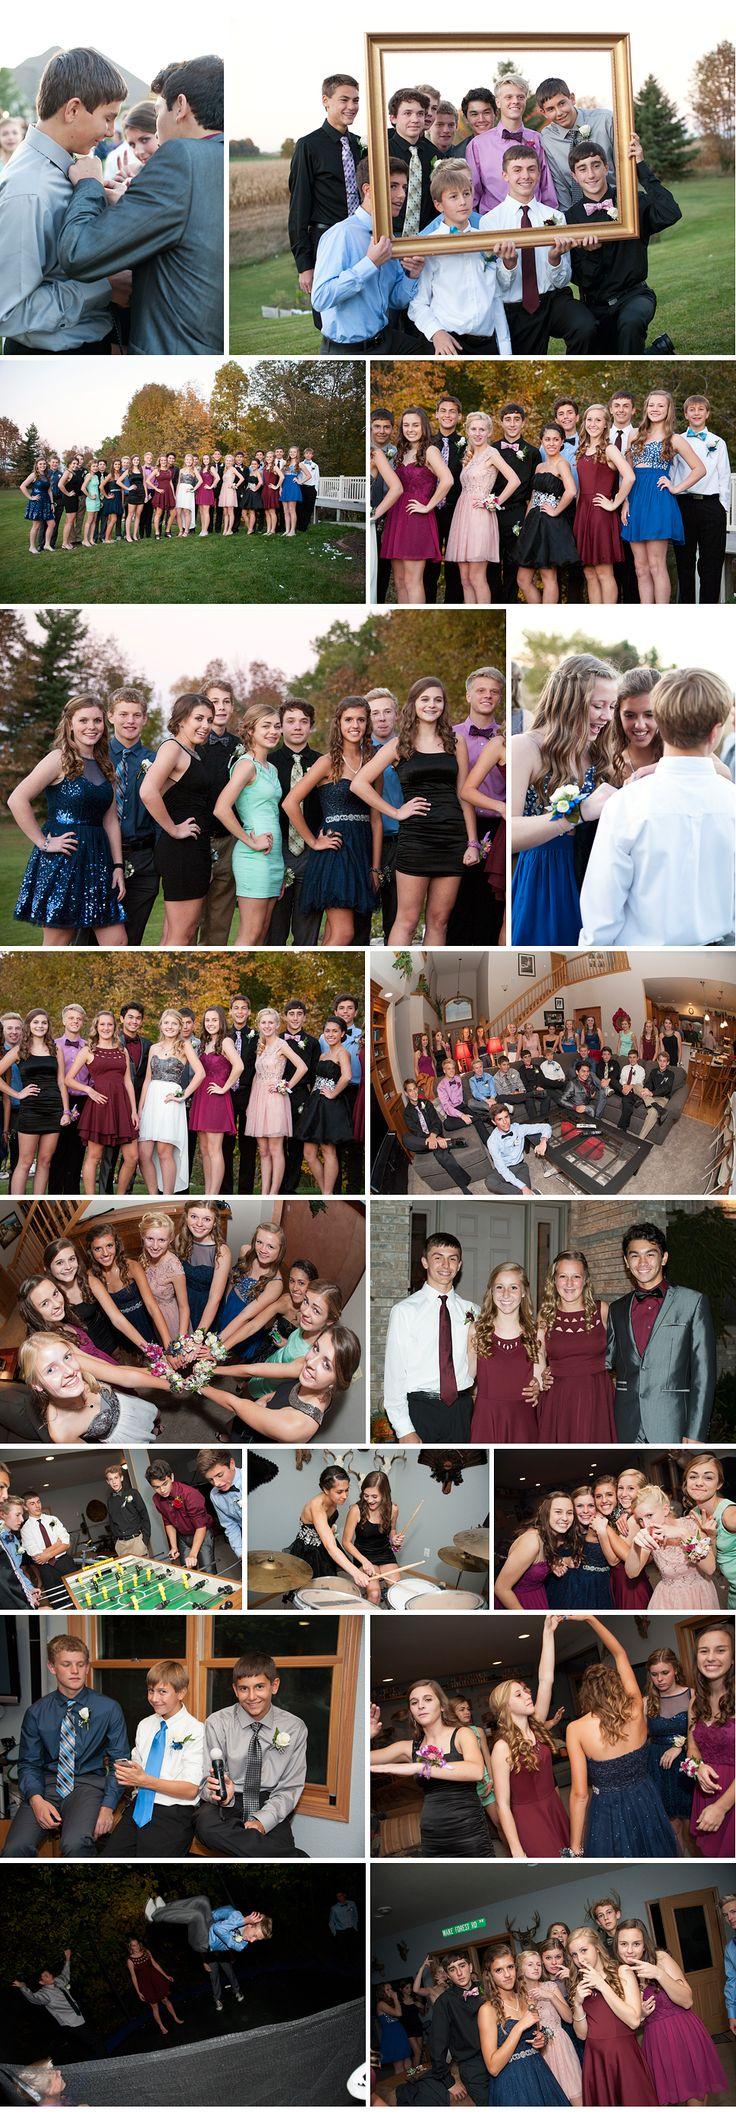 Homecoming 2014 group